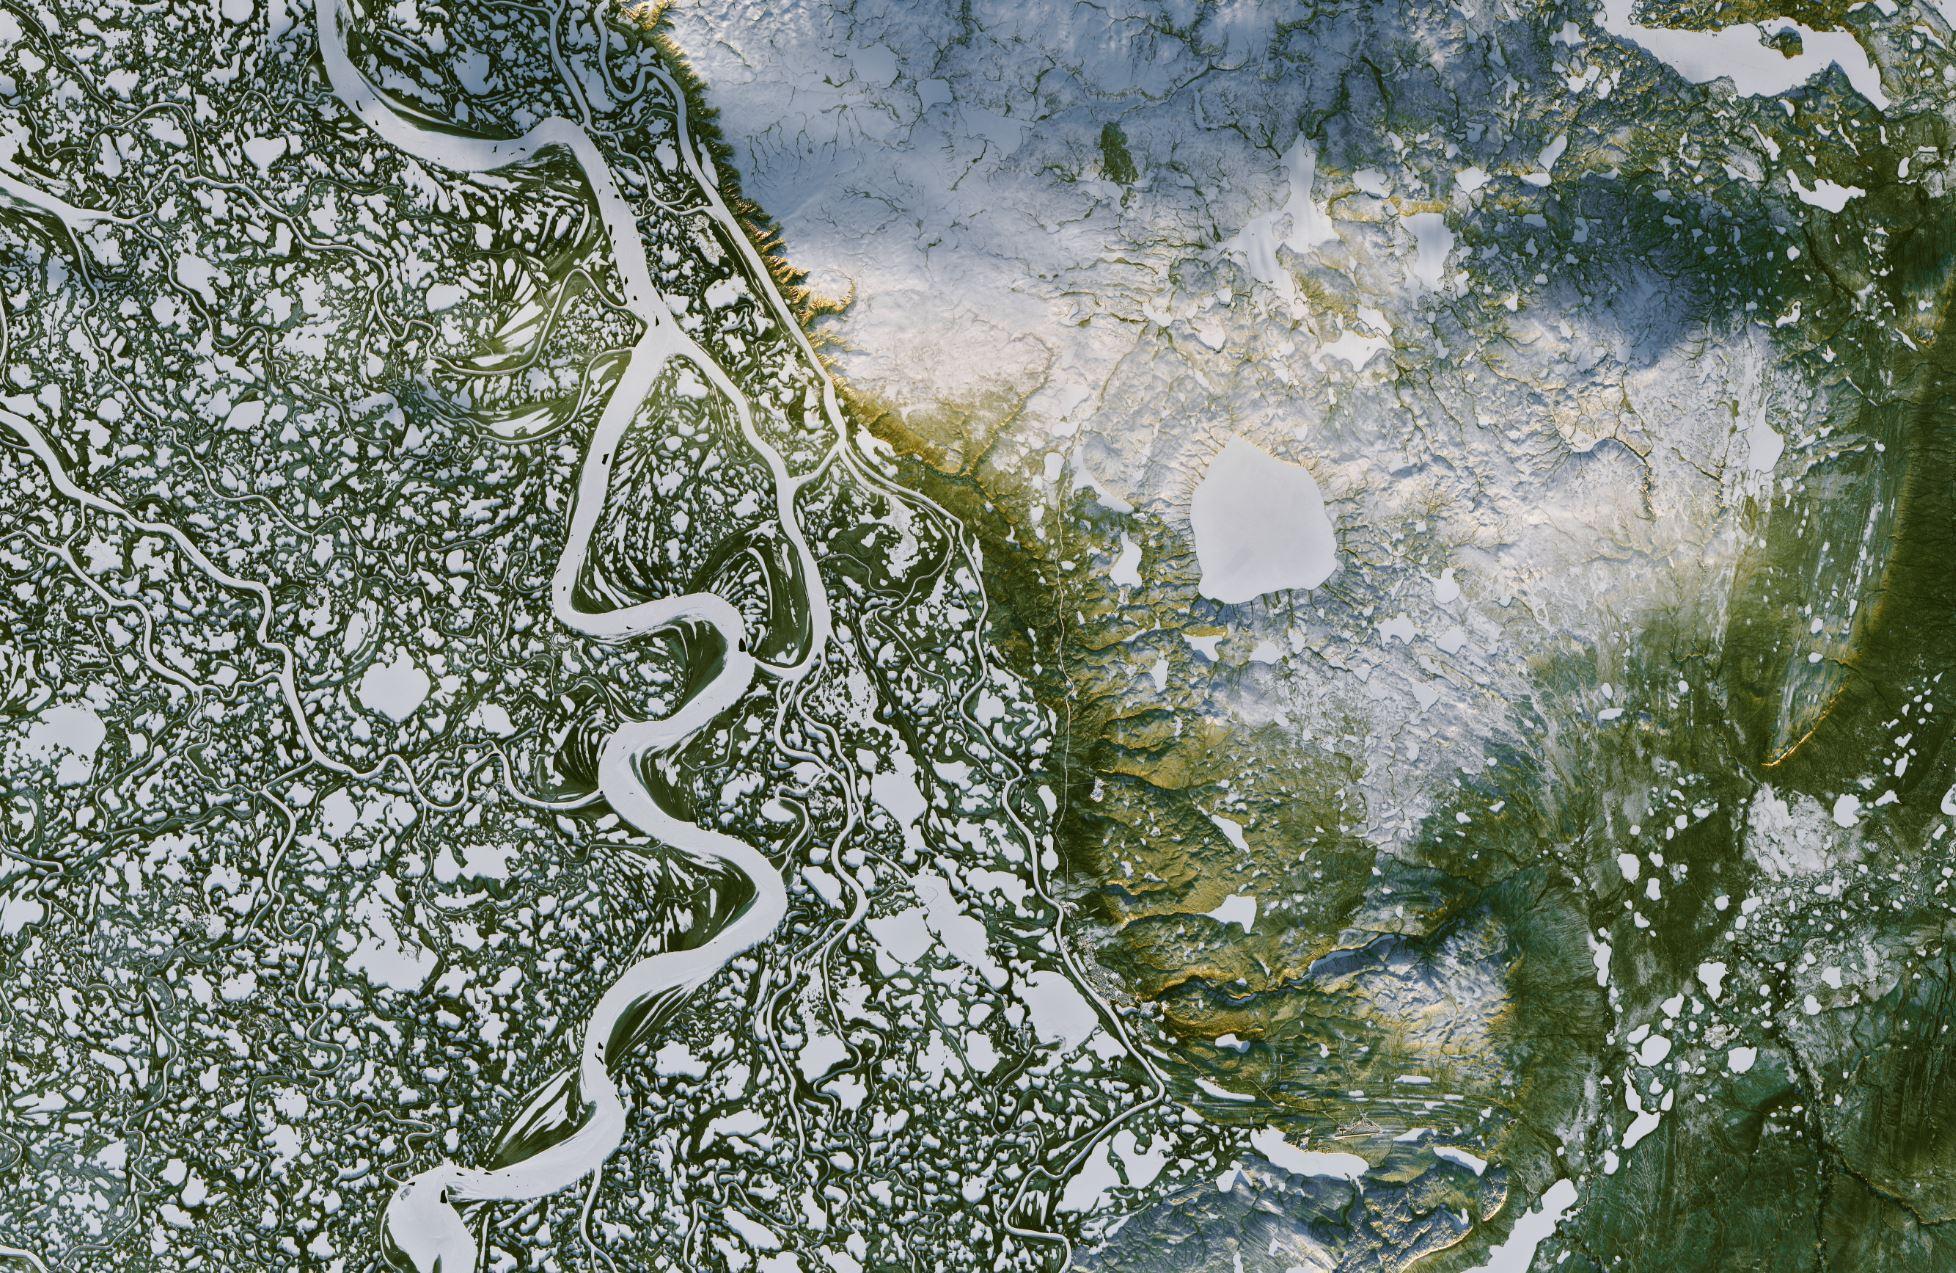 Image Credit: NASA Earth Observatory images by Joshua Stevens, using Landsat data from the  U.S. Geological Survey - Caption: Pola Lem